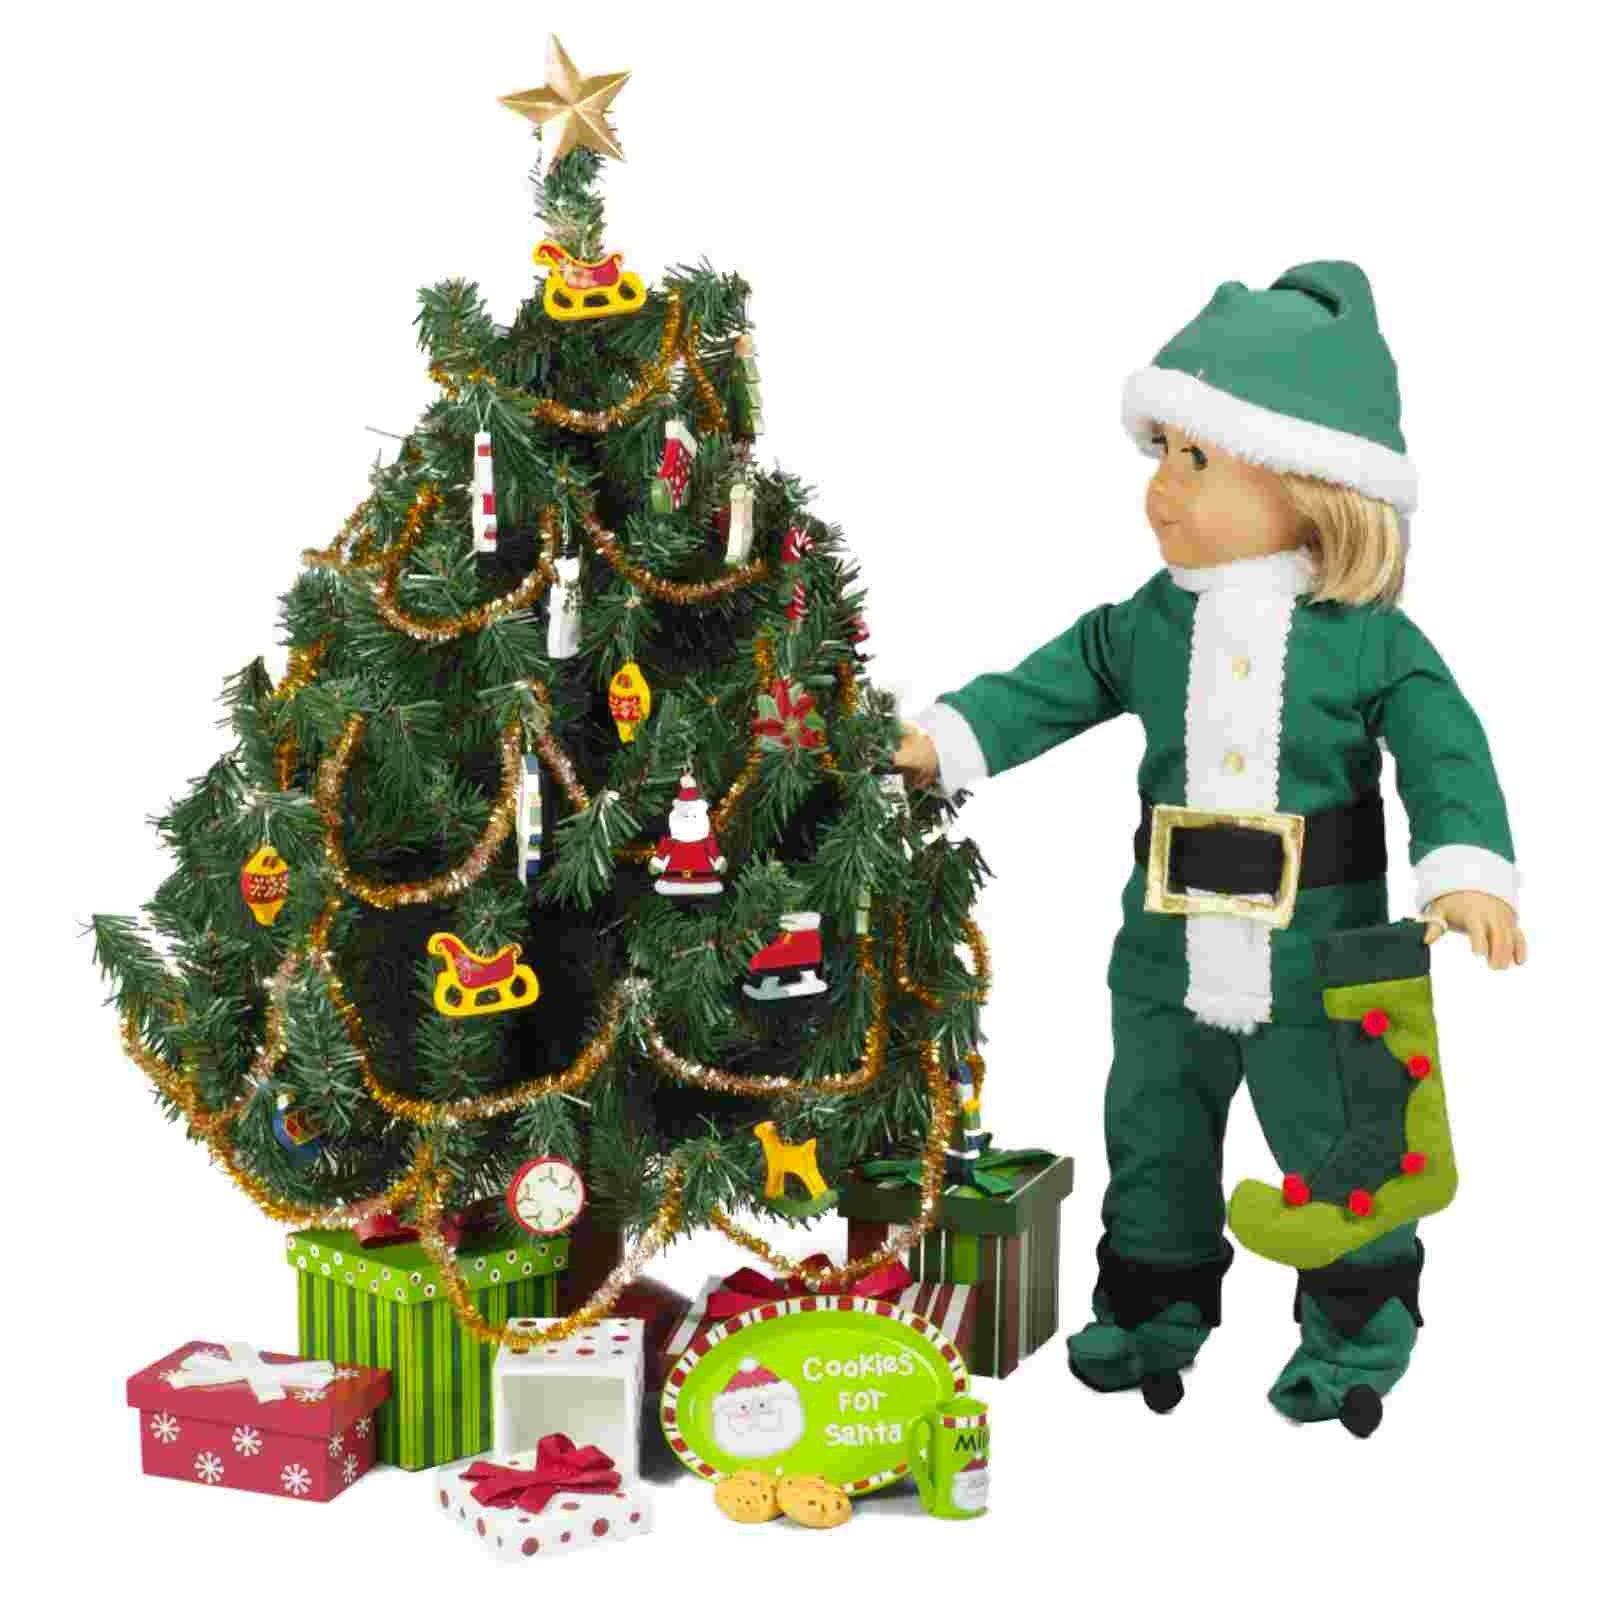 Adjustable Christmas Tree Stand